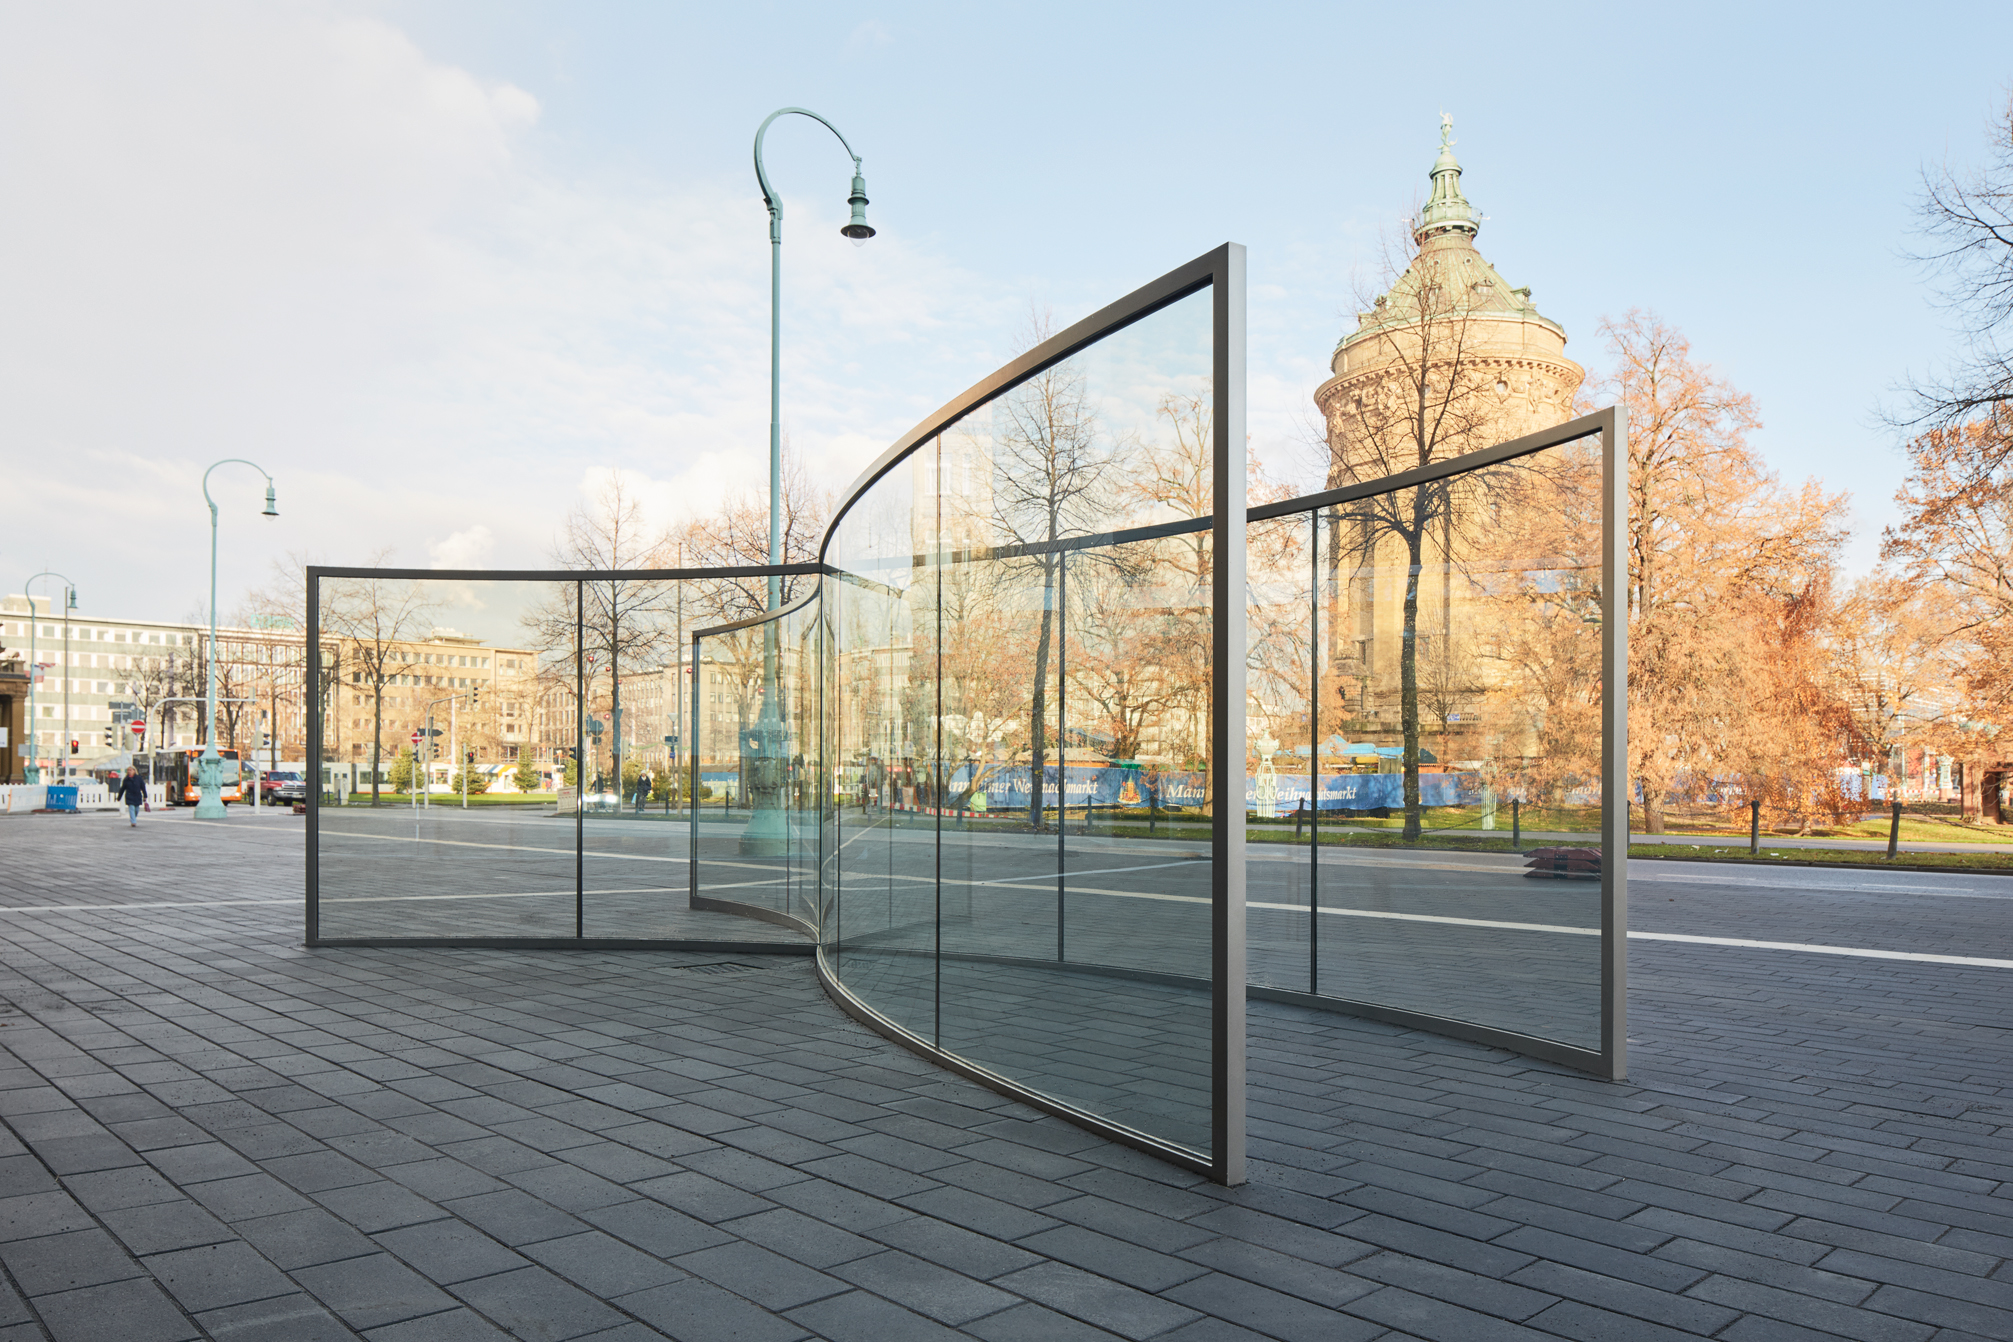 © Dan Graham Foto: Kunsthalle Mannheim / Rainer Diehl